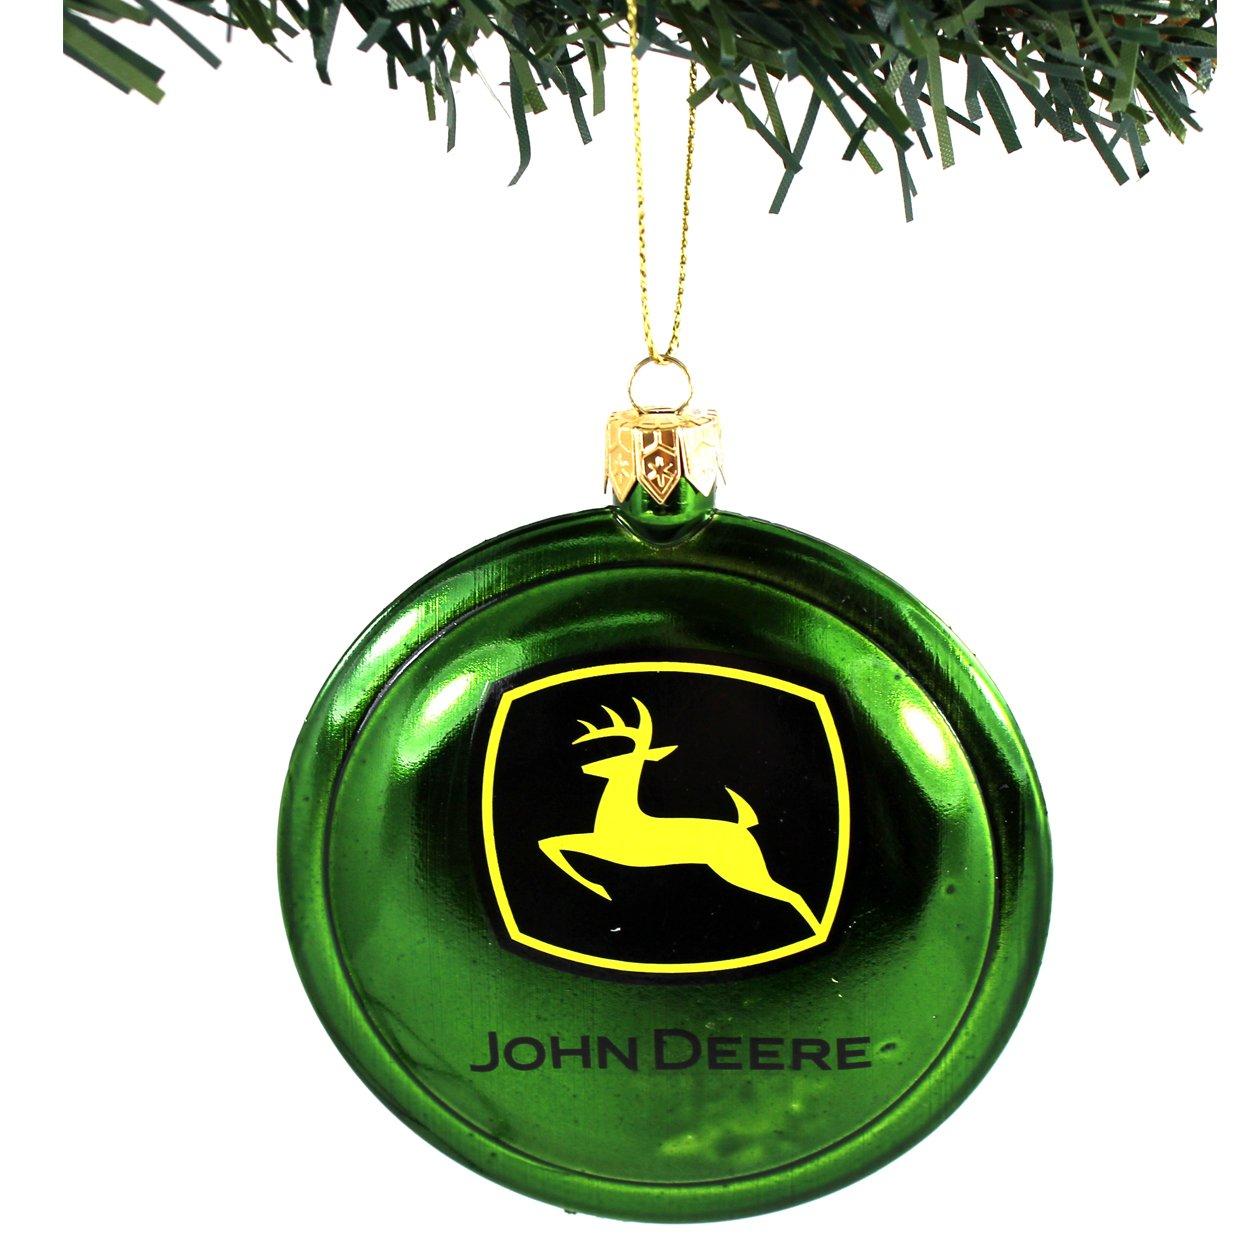 John Deere Kurt Adler Ornaments Gift Boxed (JD Logo Disc): Amazon.ca ...